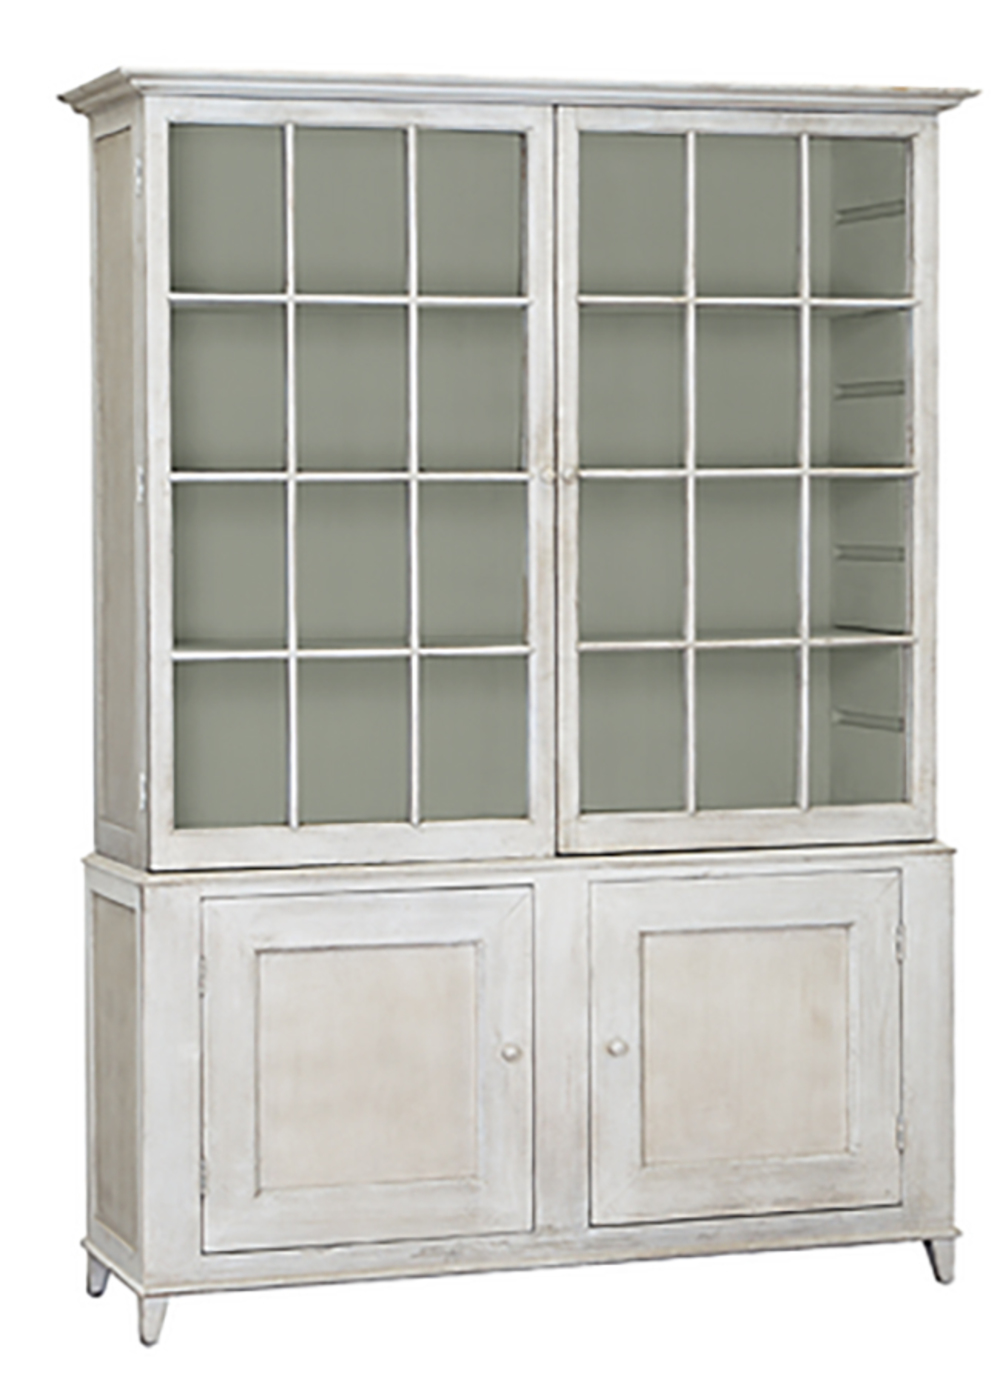 Dovetail Furniture - Greko Cabinet